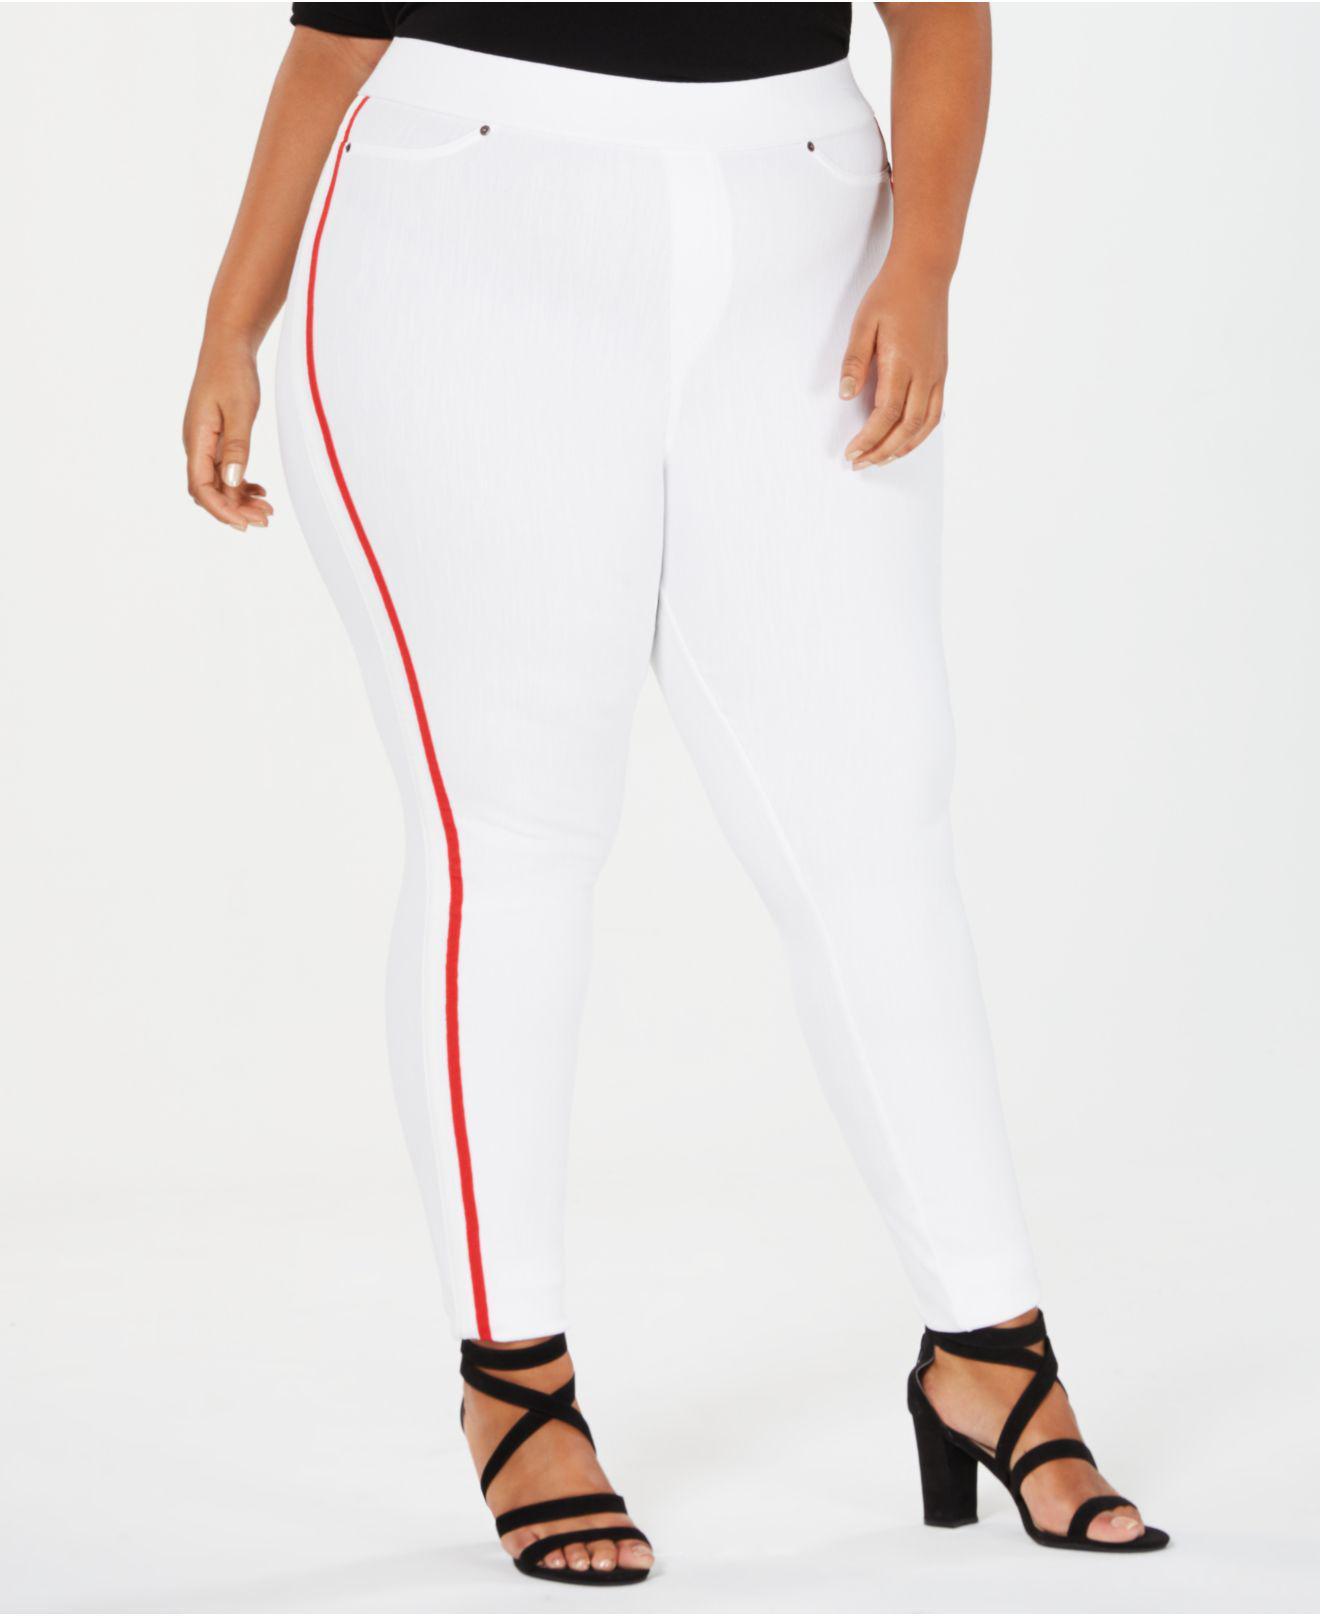 f2a56c90d6fdb Lyst - Hue ® Plus Size Racer Stripe Original Denim Leggings in White